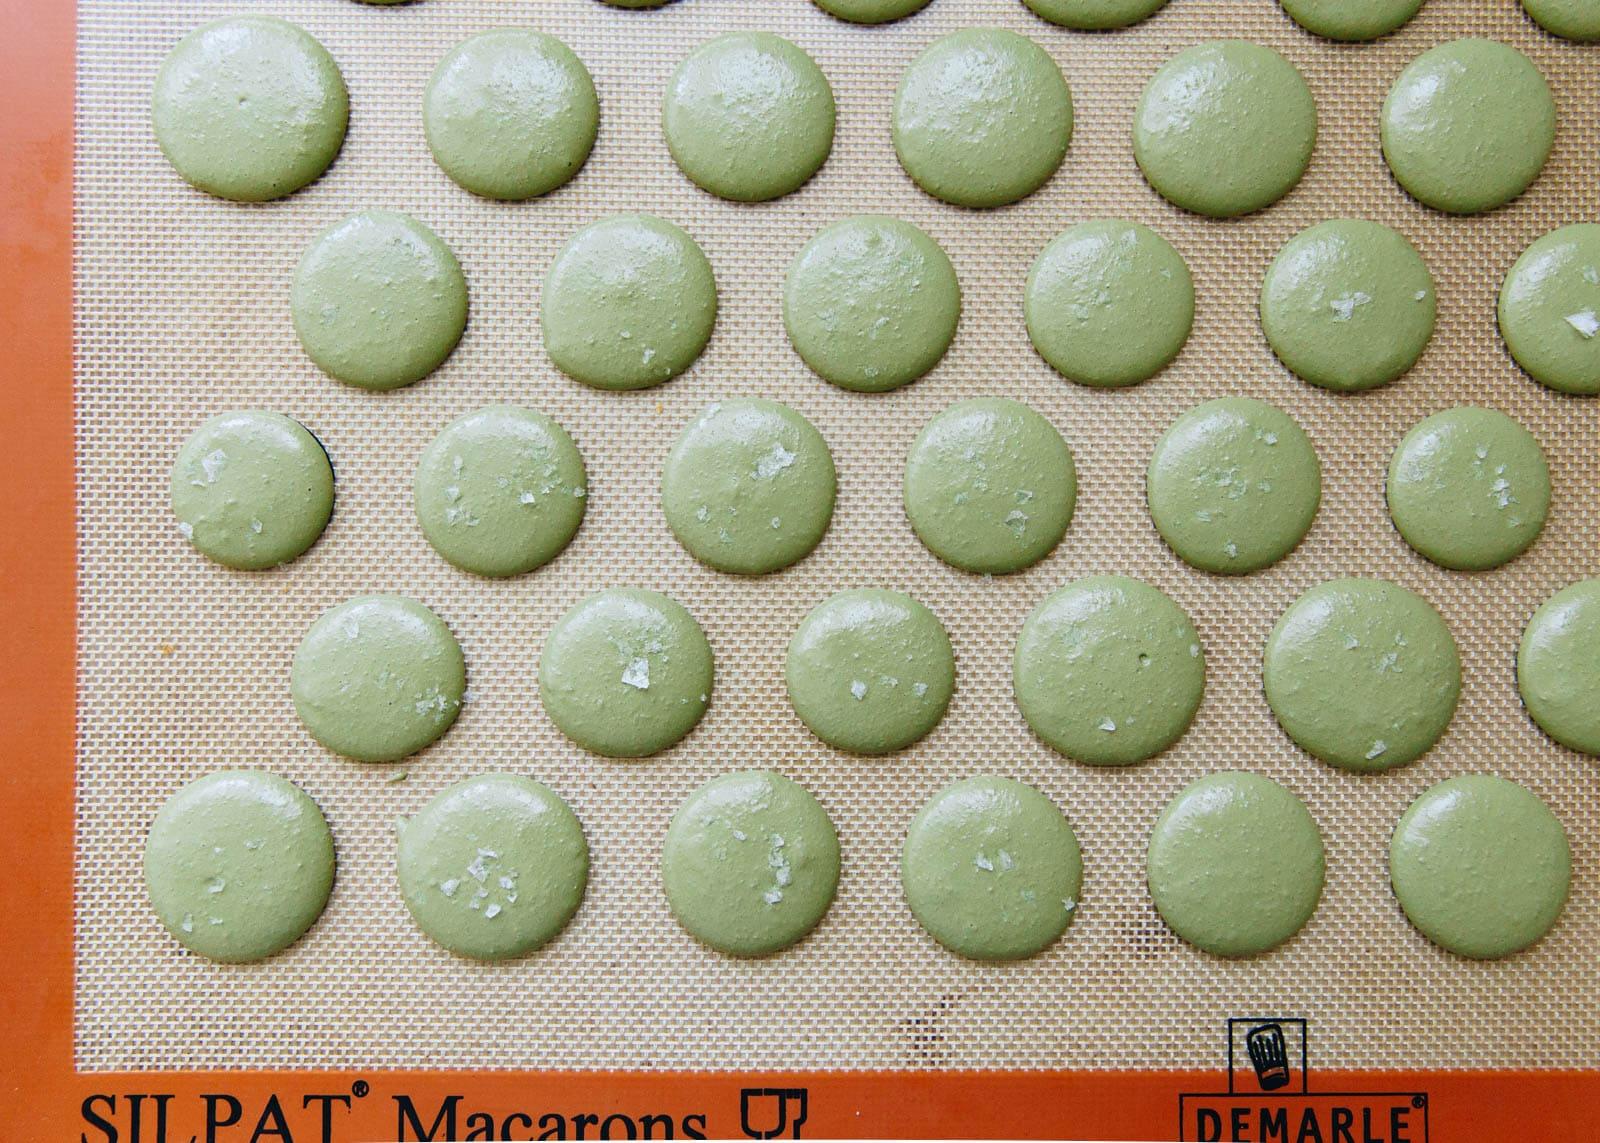 Pistachio macarons with a white chocolate pistachio ganache. Zomg.